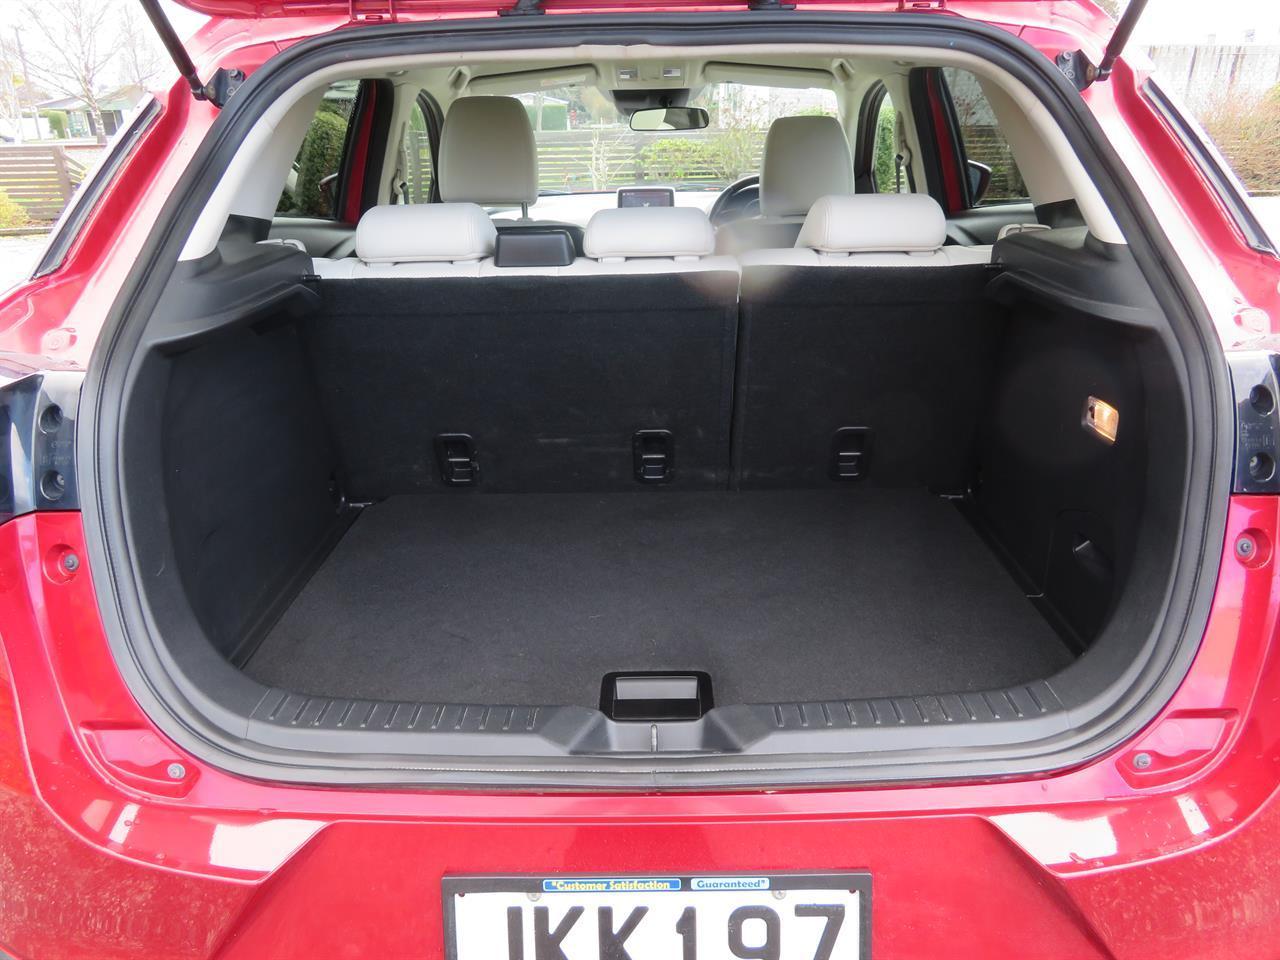 image-7, 2015 Mazda CX-3 LTD AWD at Gore